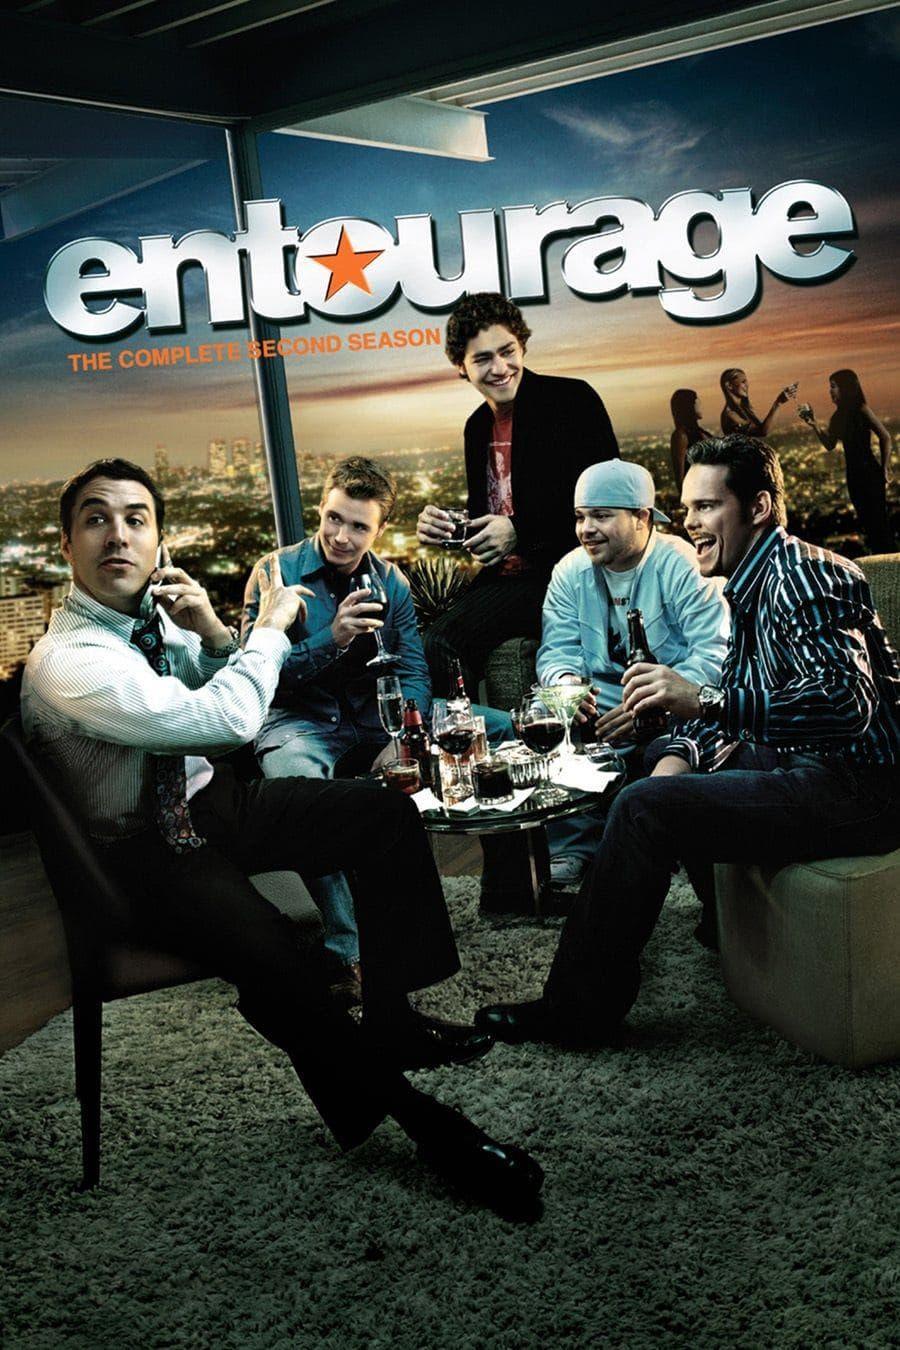 Image of Random Best Seasons of 'Entourage'